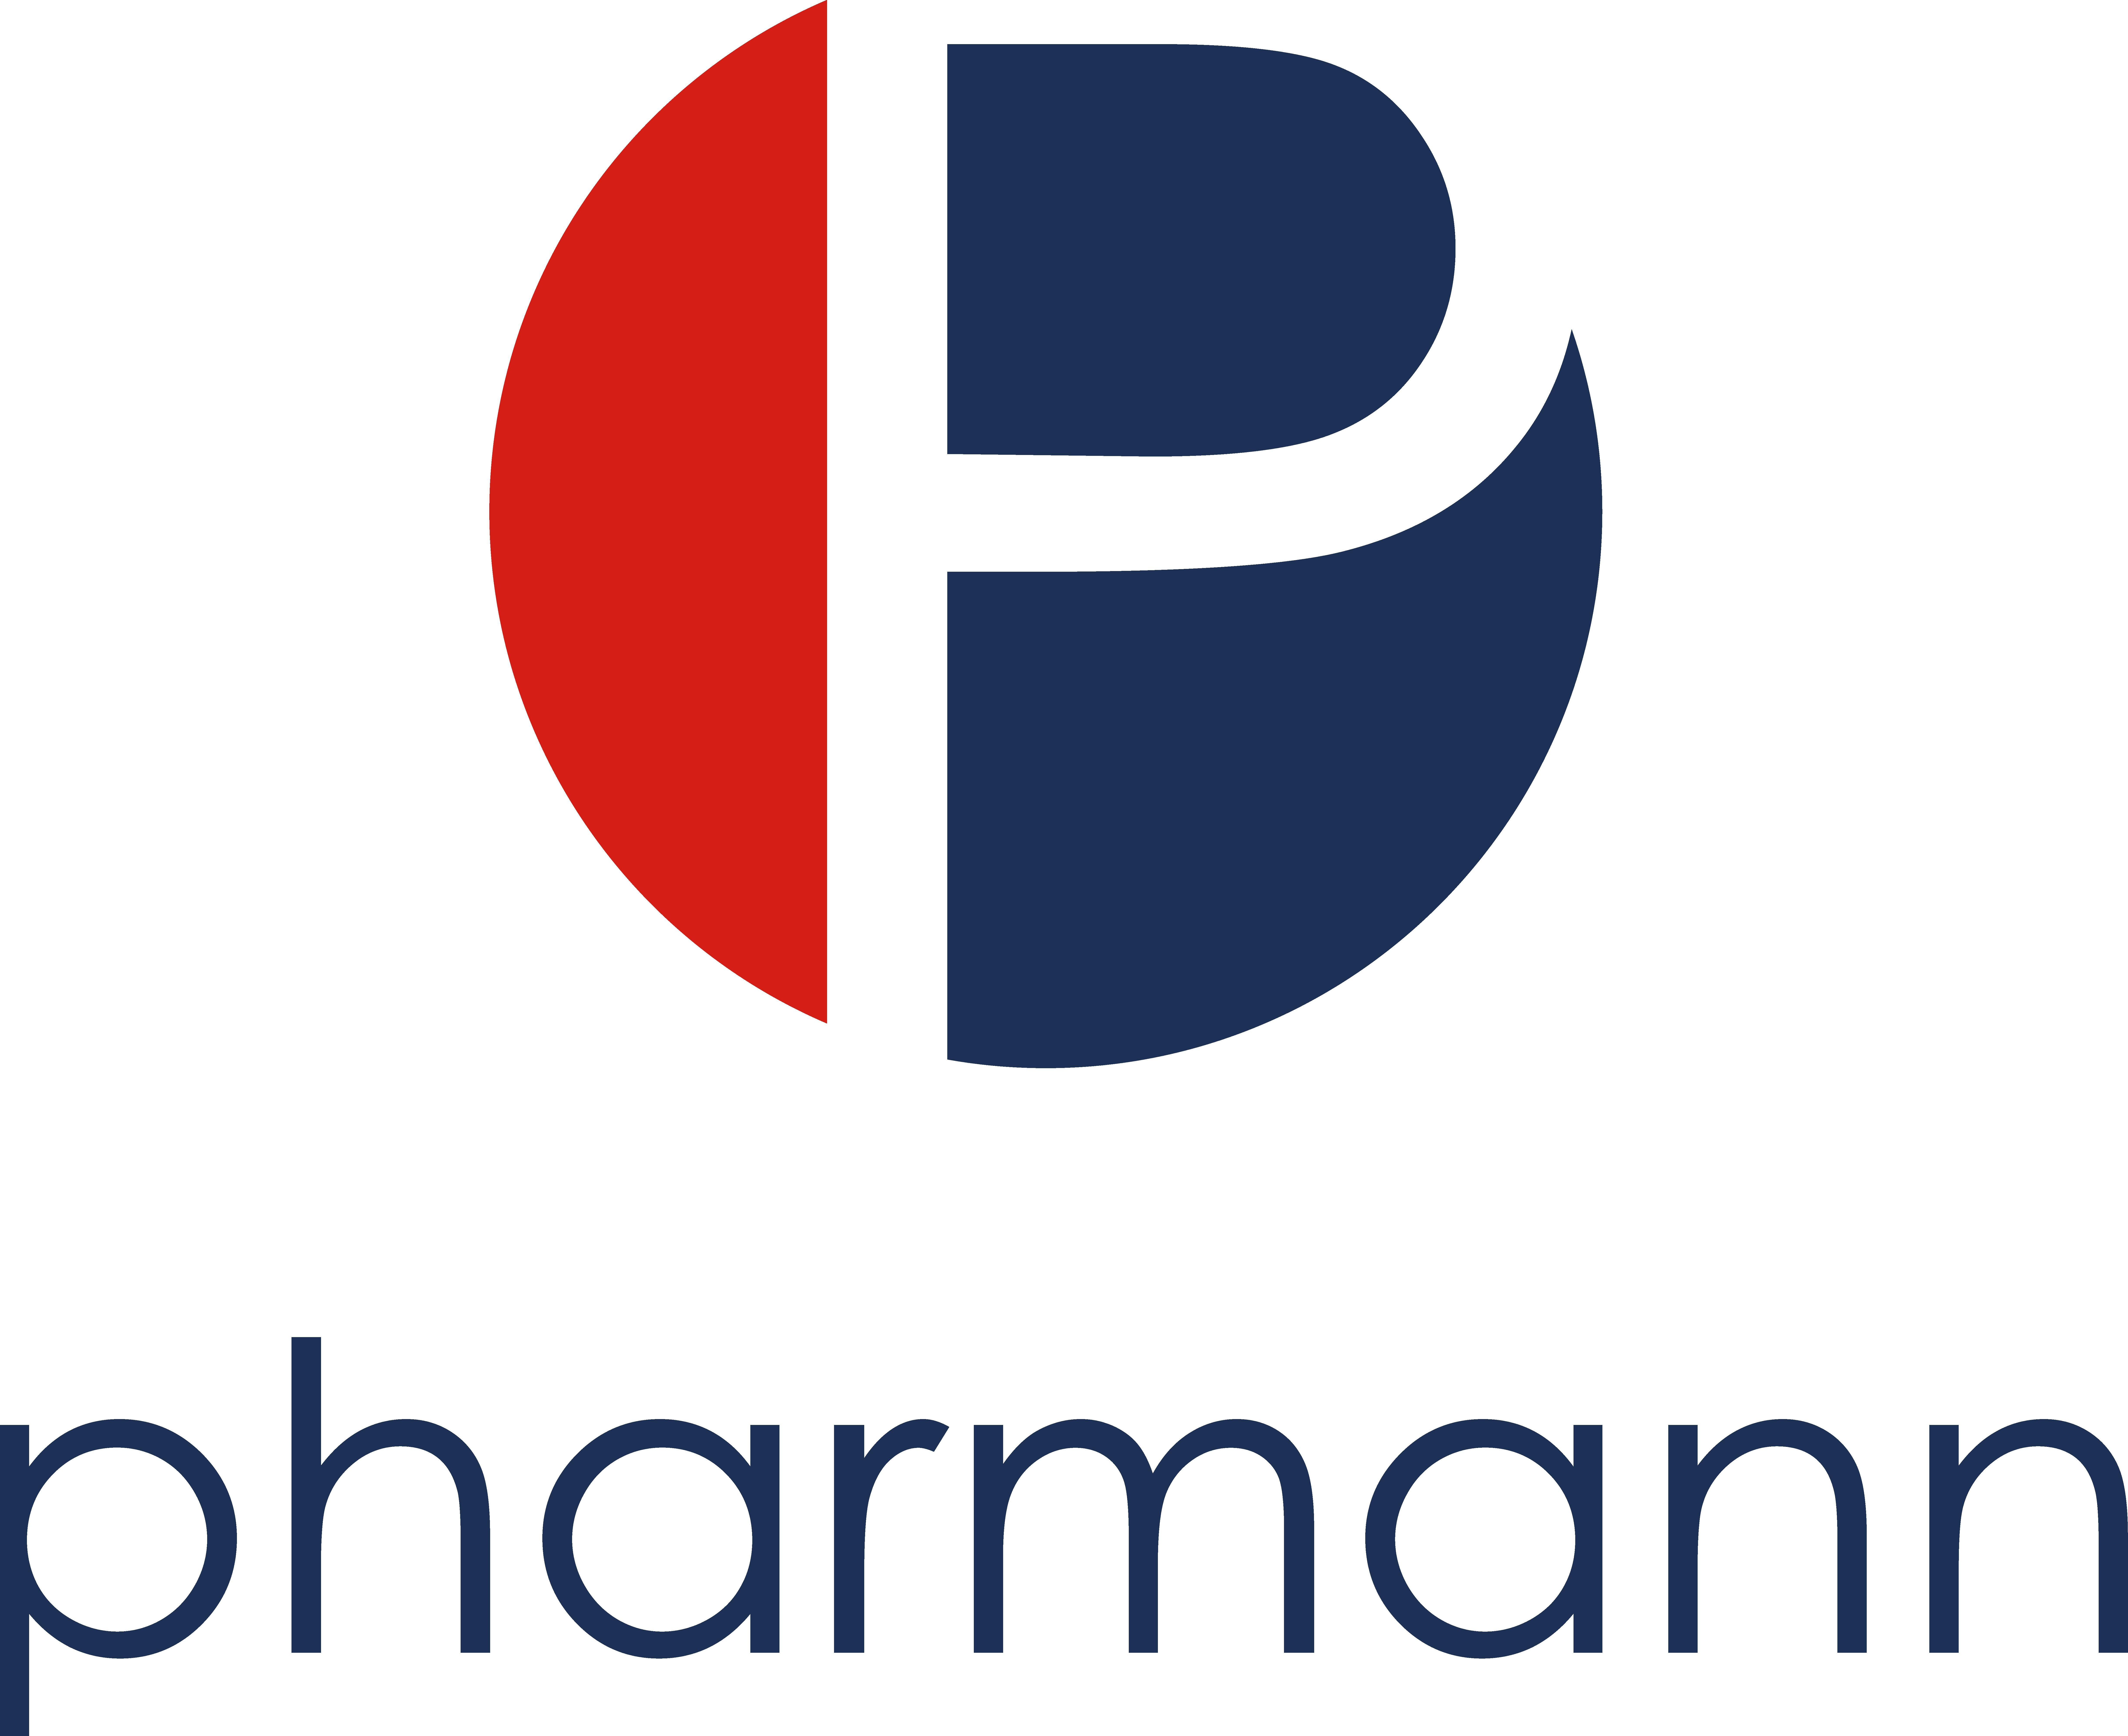 PHARMANN